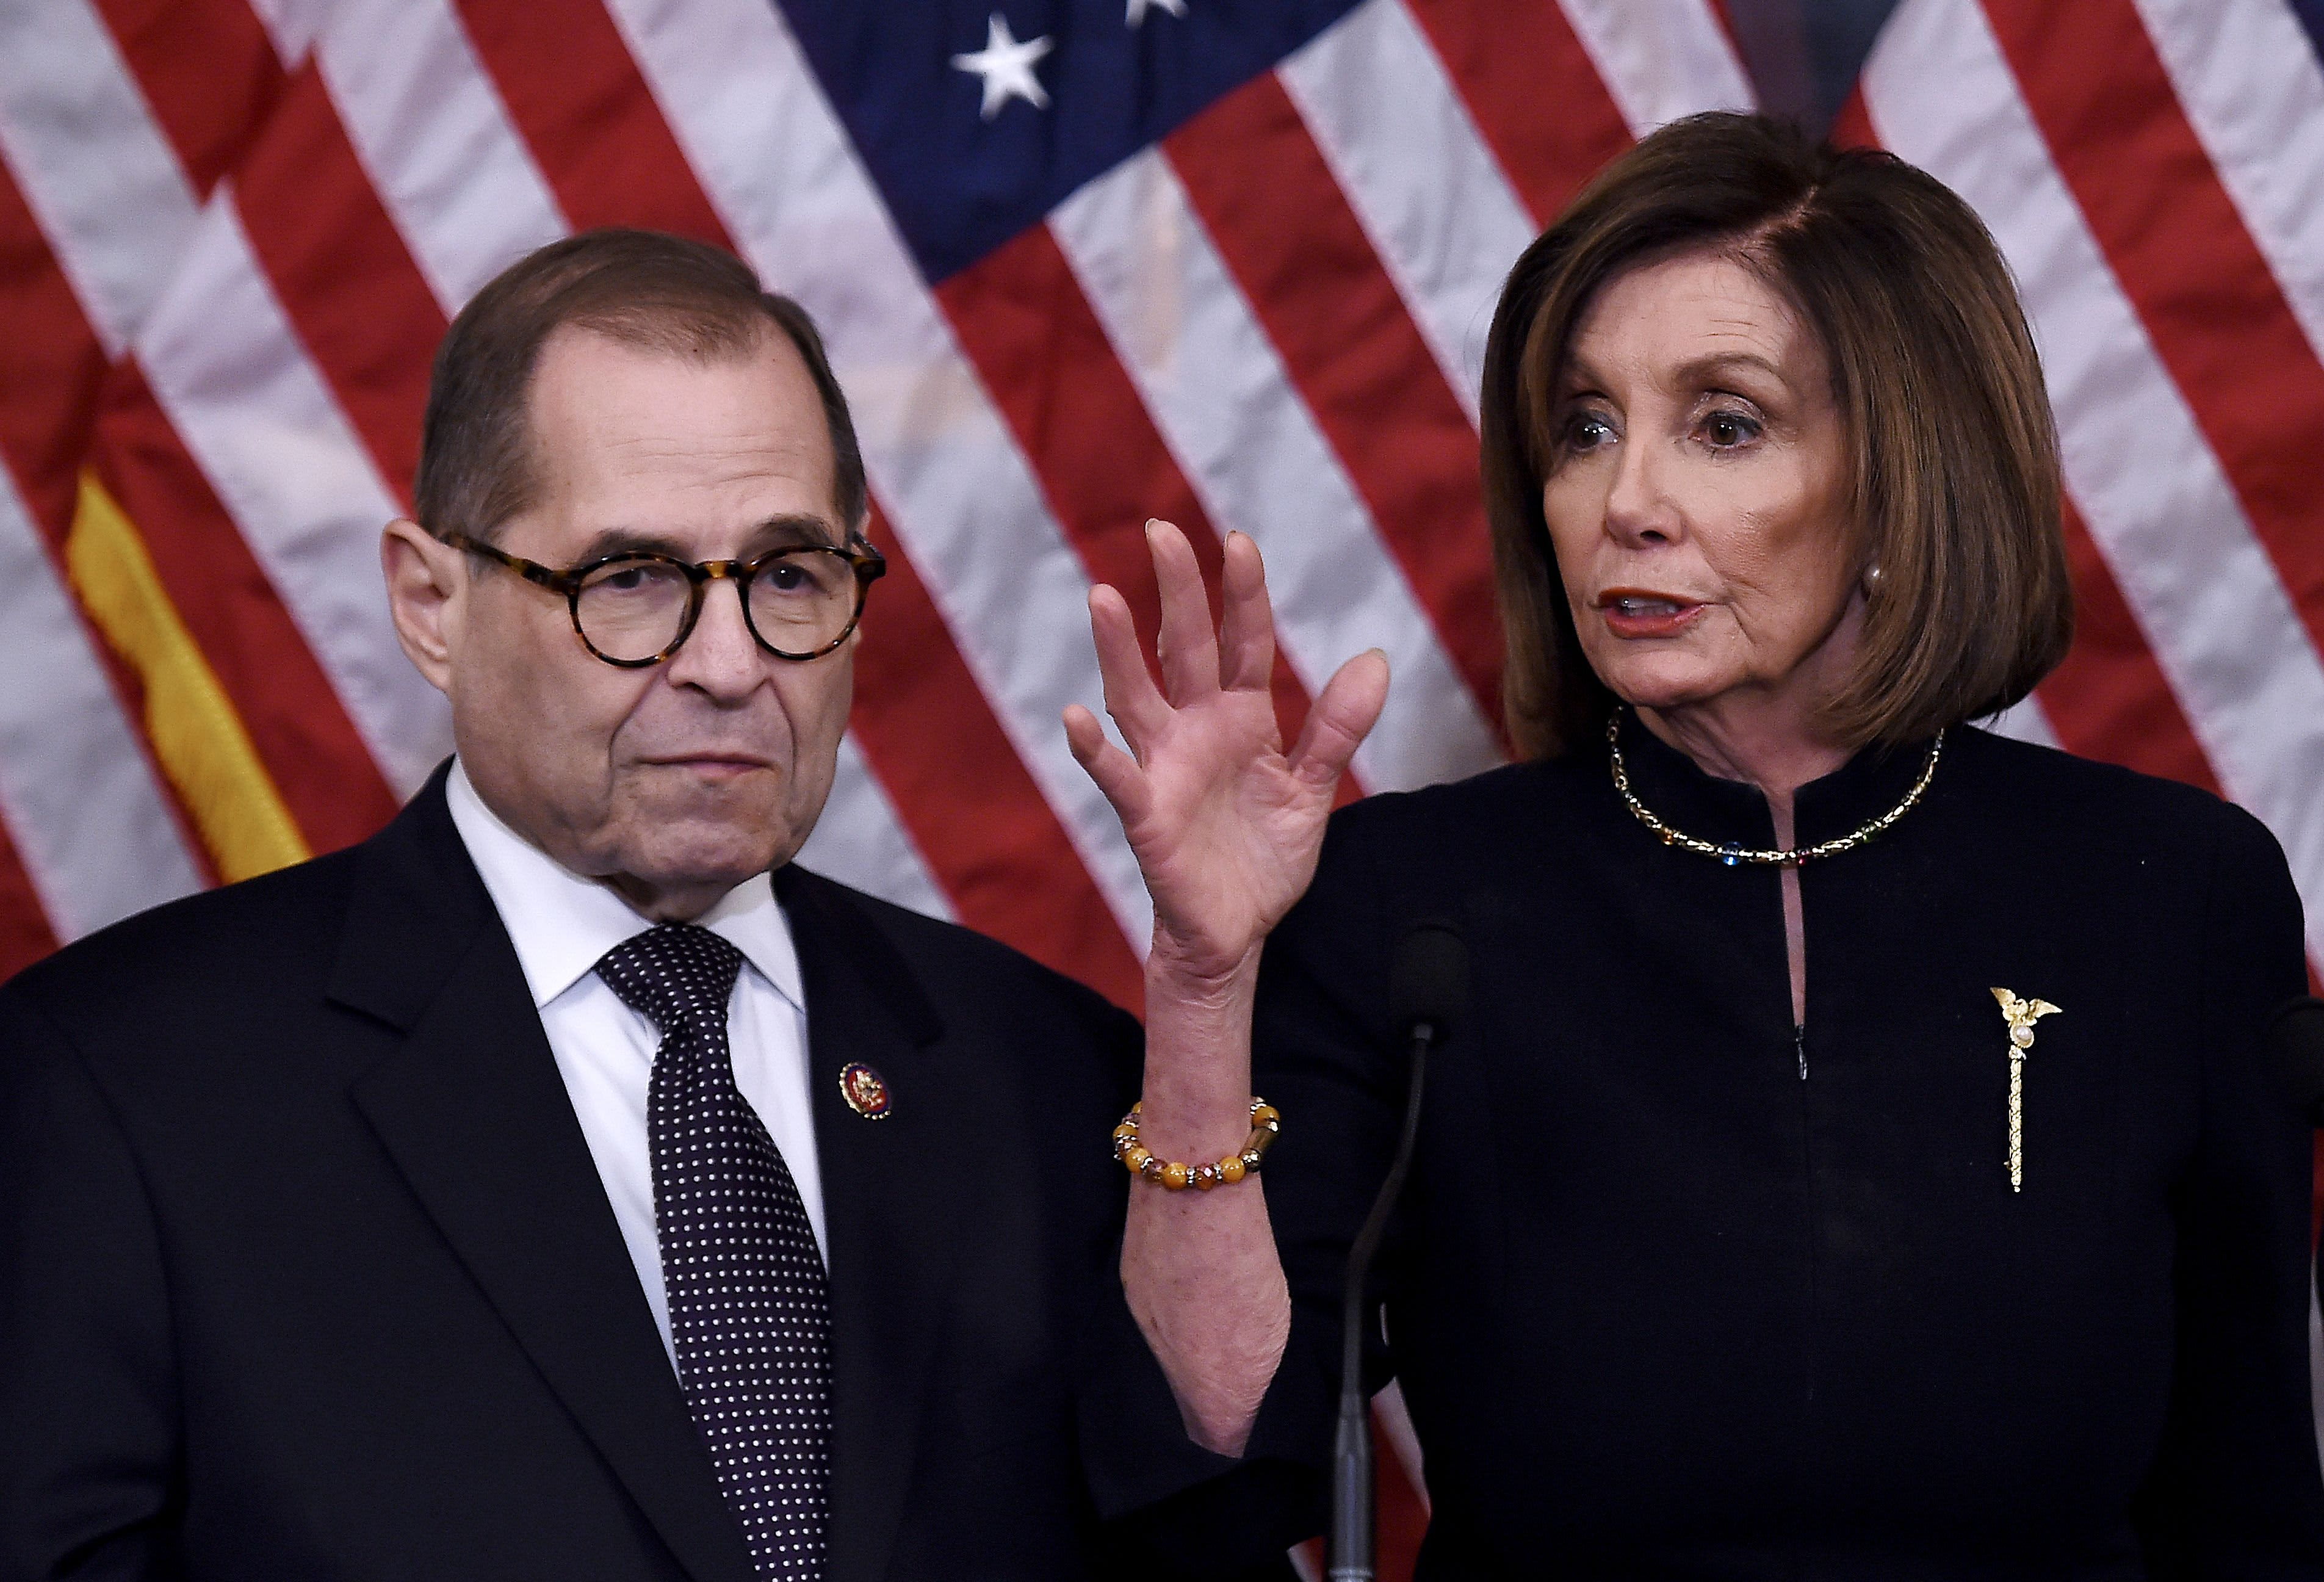 House prepares to vote Wednesday to transmit Trump impeachment articles to the Senate